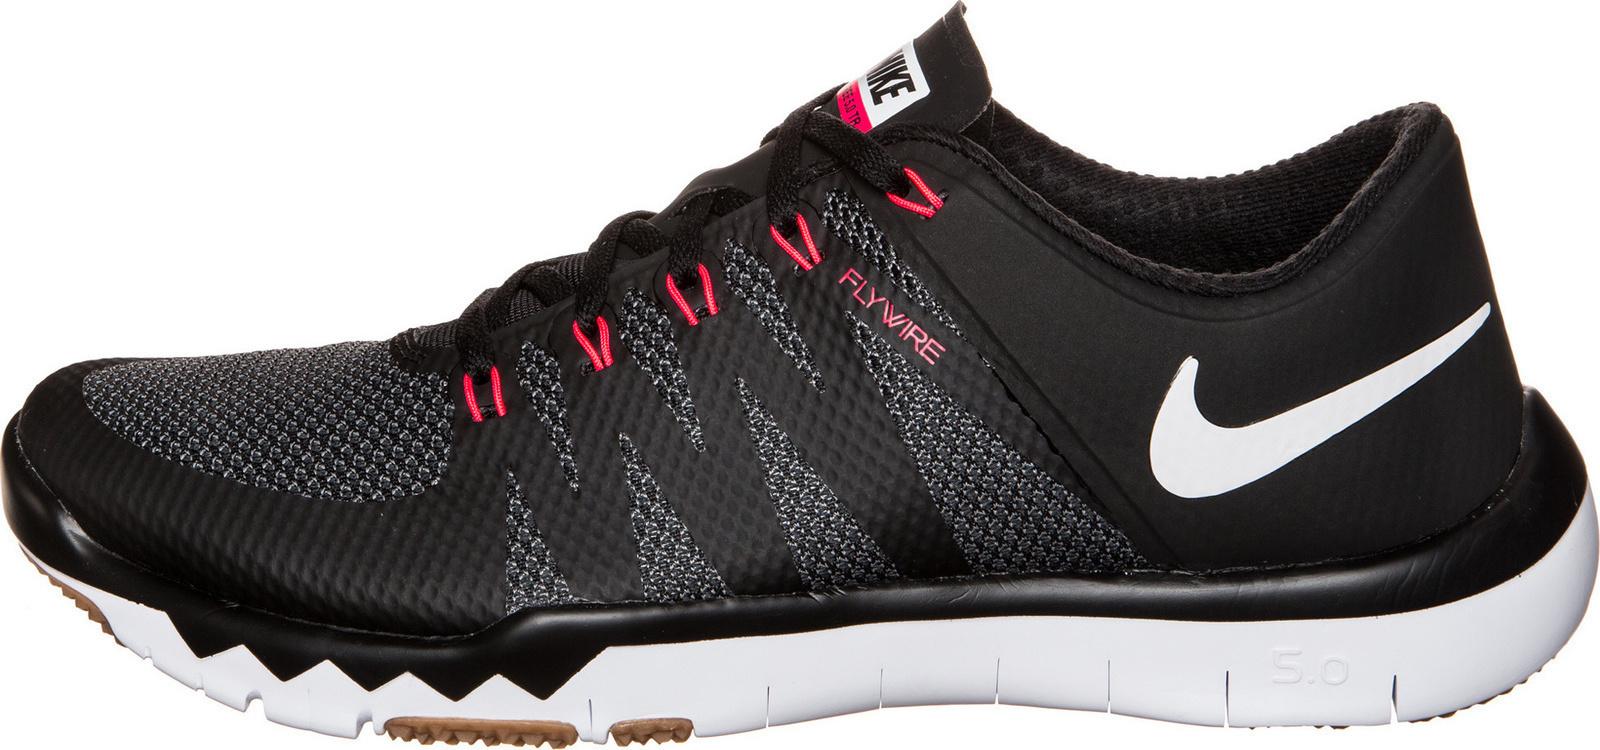 0f3e3de992c ... Προσθήκη στη σύγκριση Προσθήκη στα αγαπημένα menu Nike Free Trainer 5.0  V6 719922-016 ...